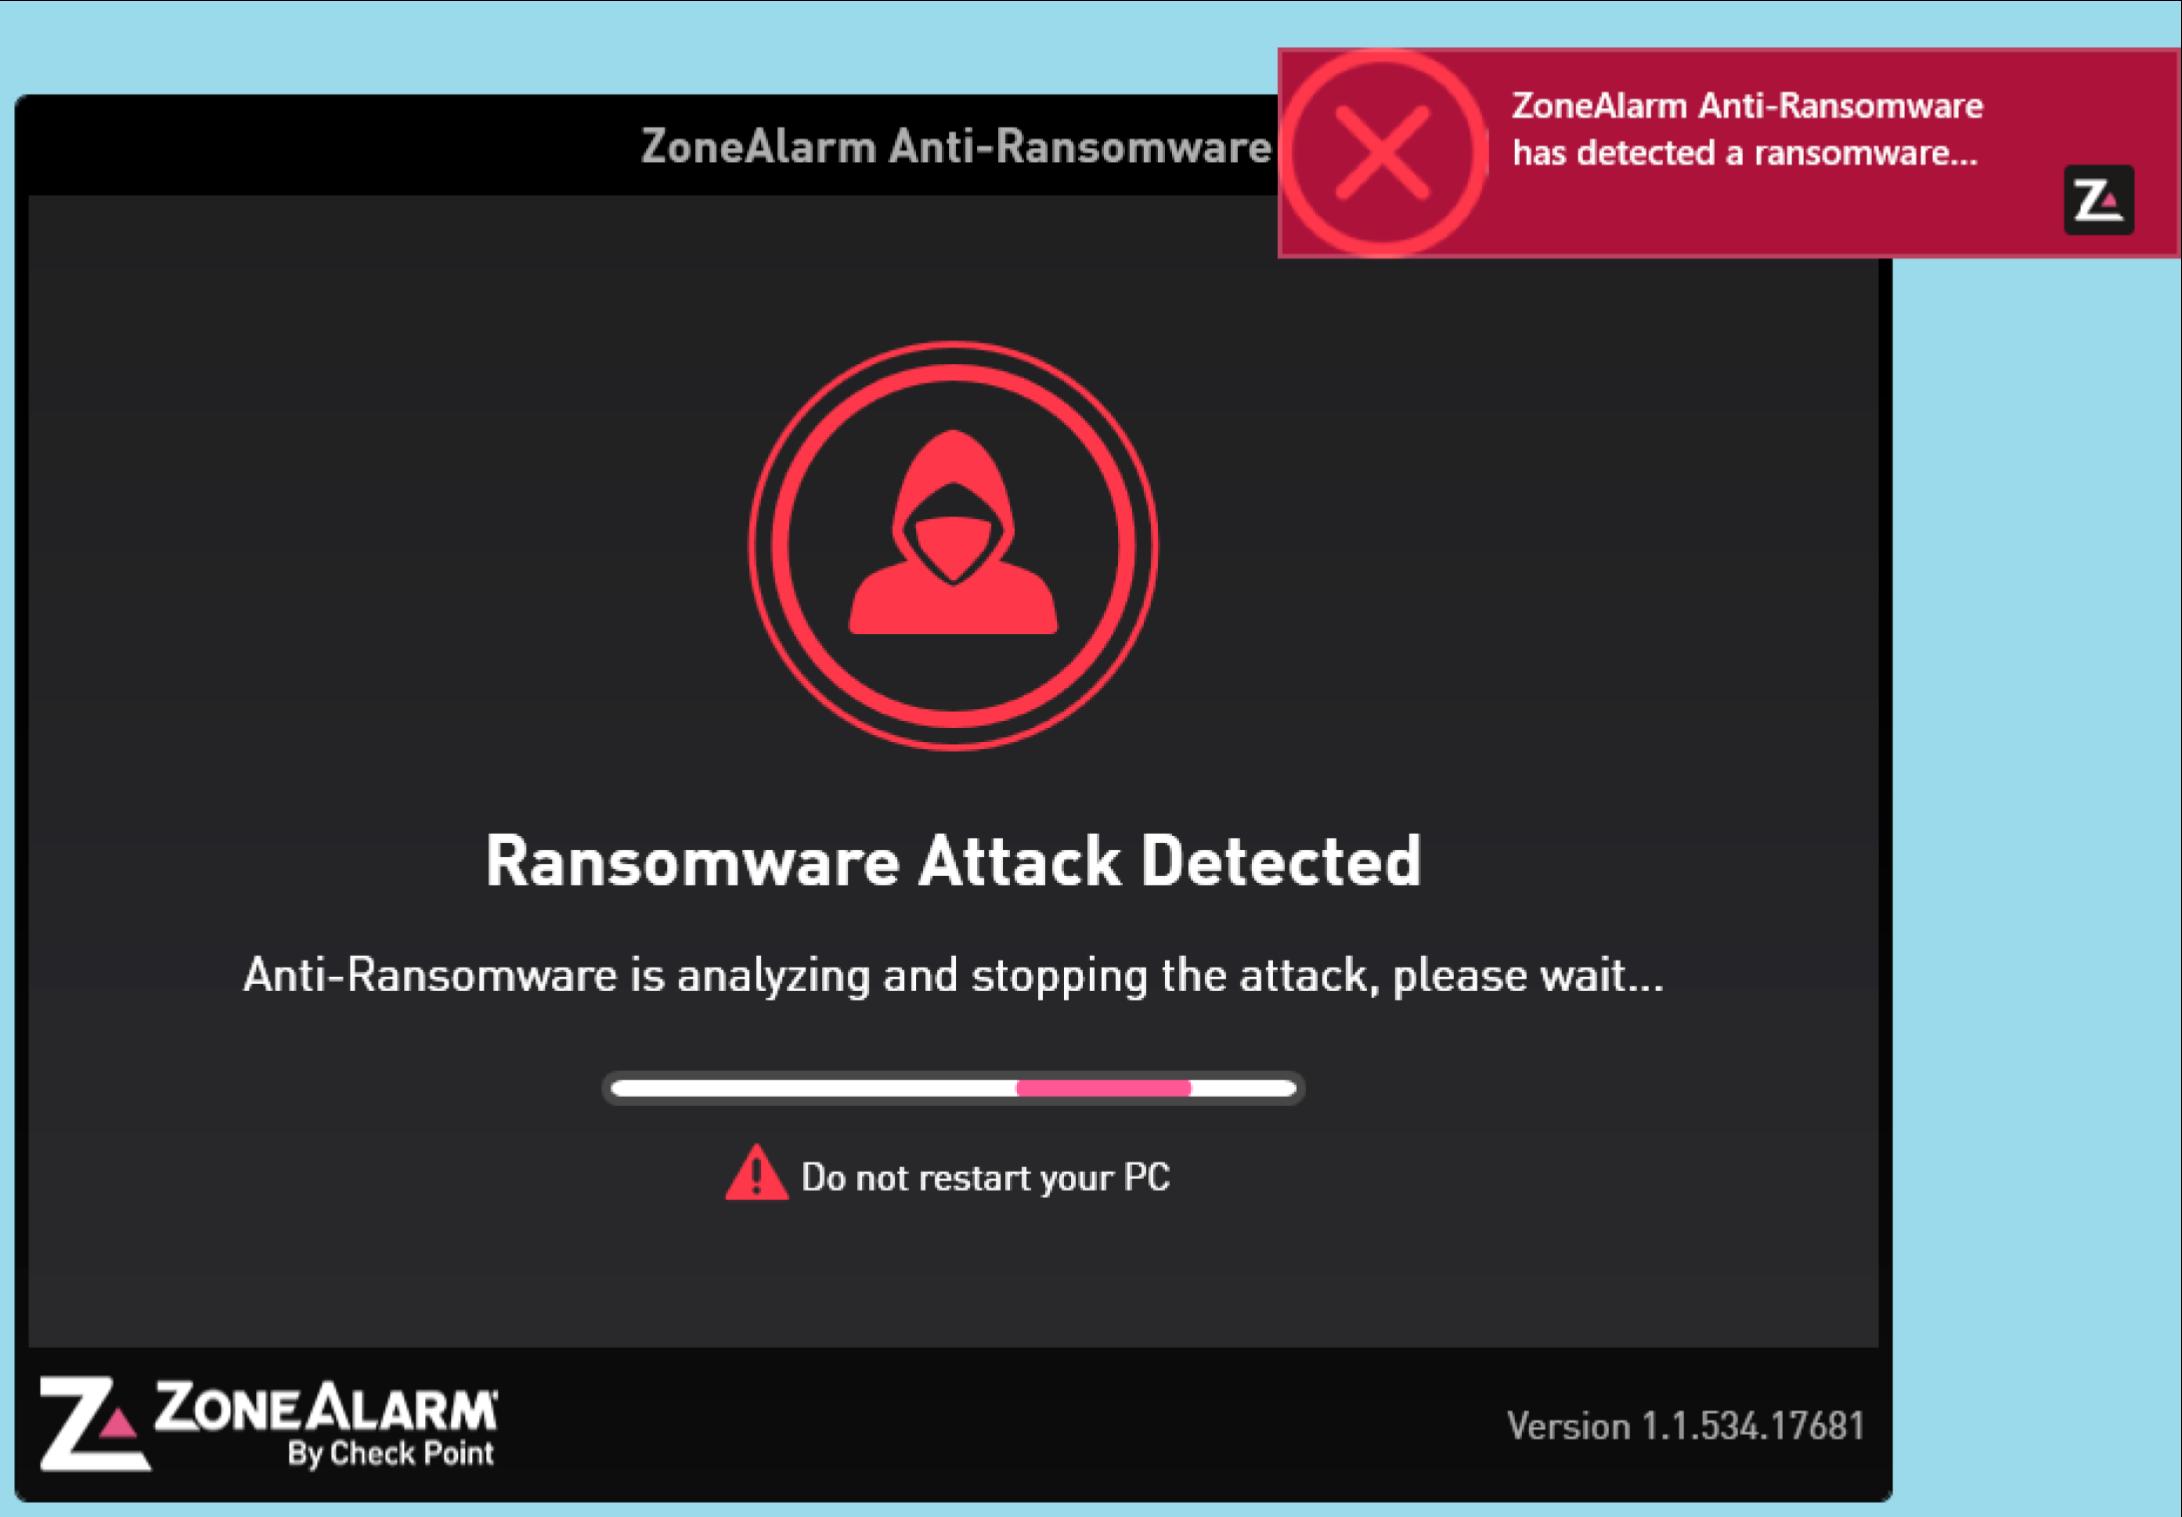 Le logiciel ZoneAlarm Anti-Ransomware.